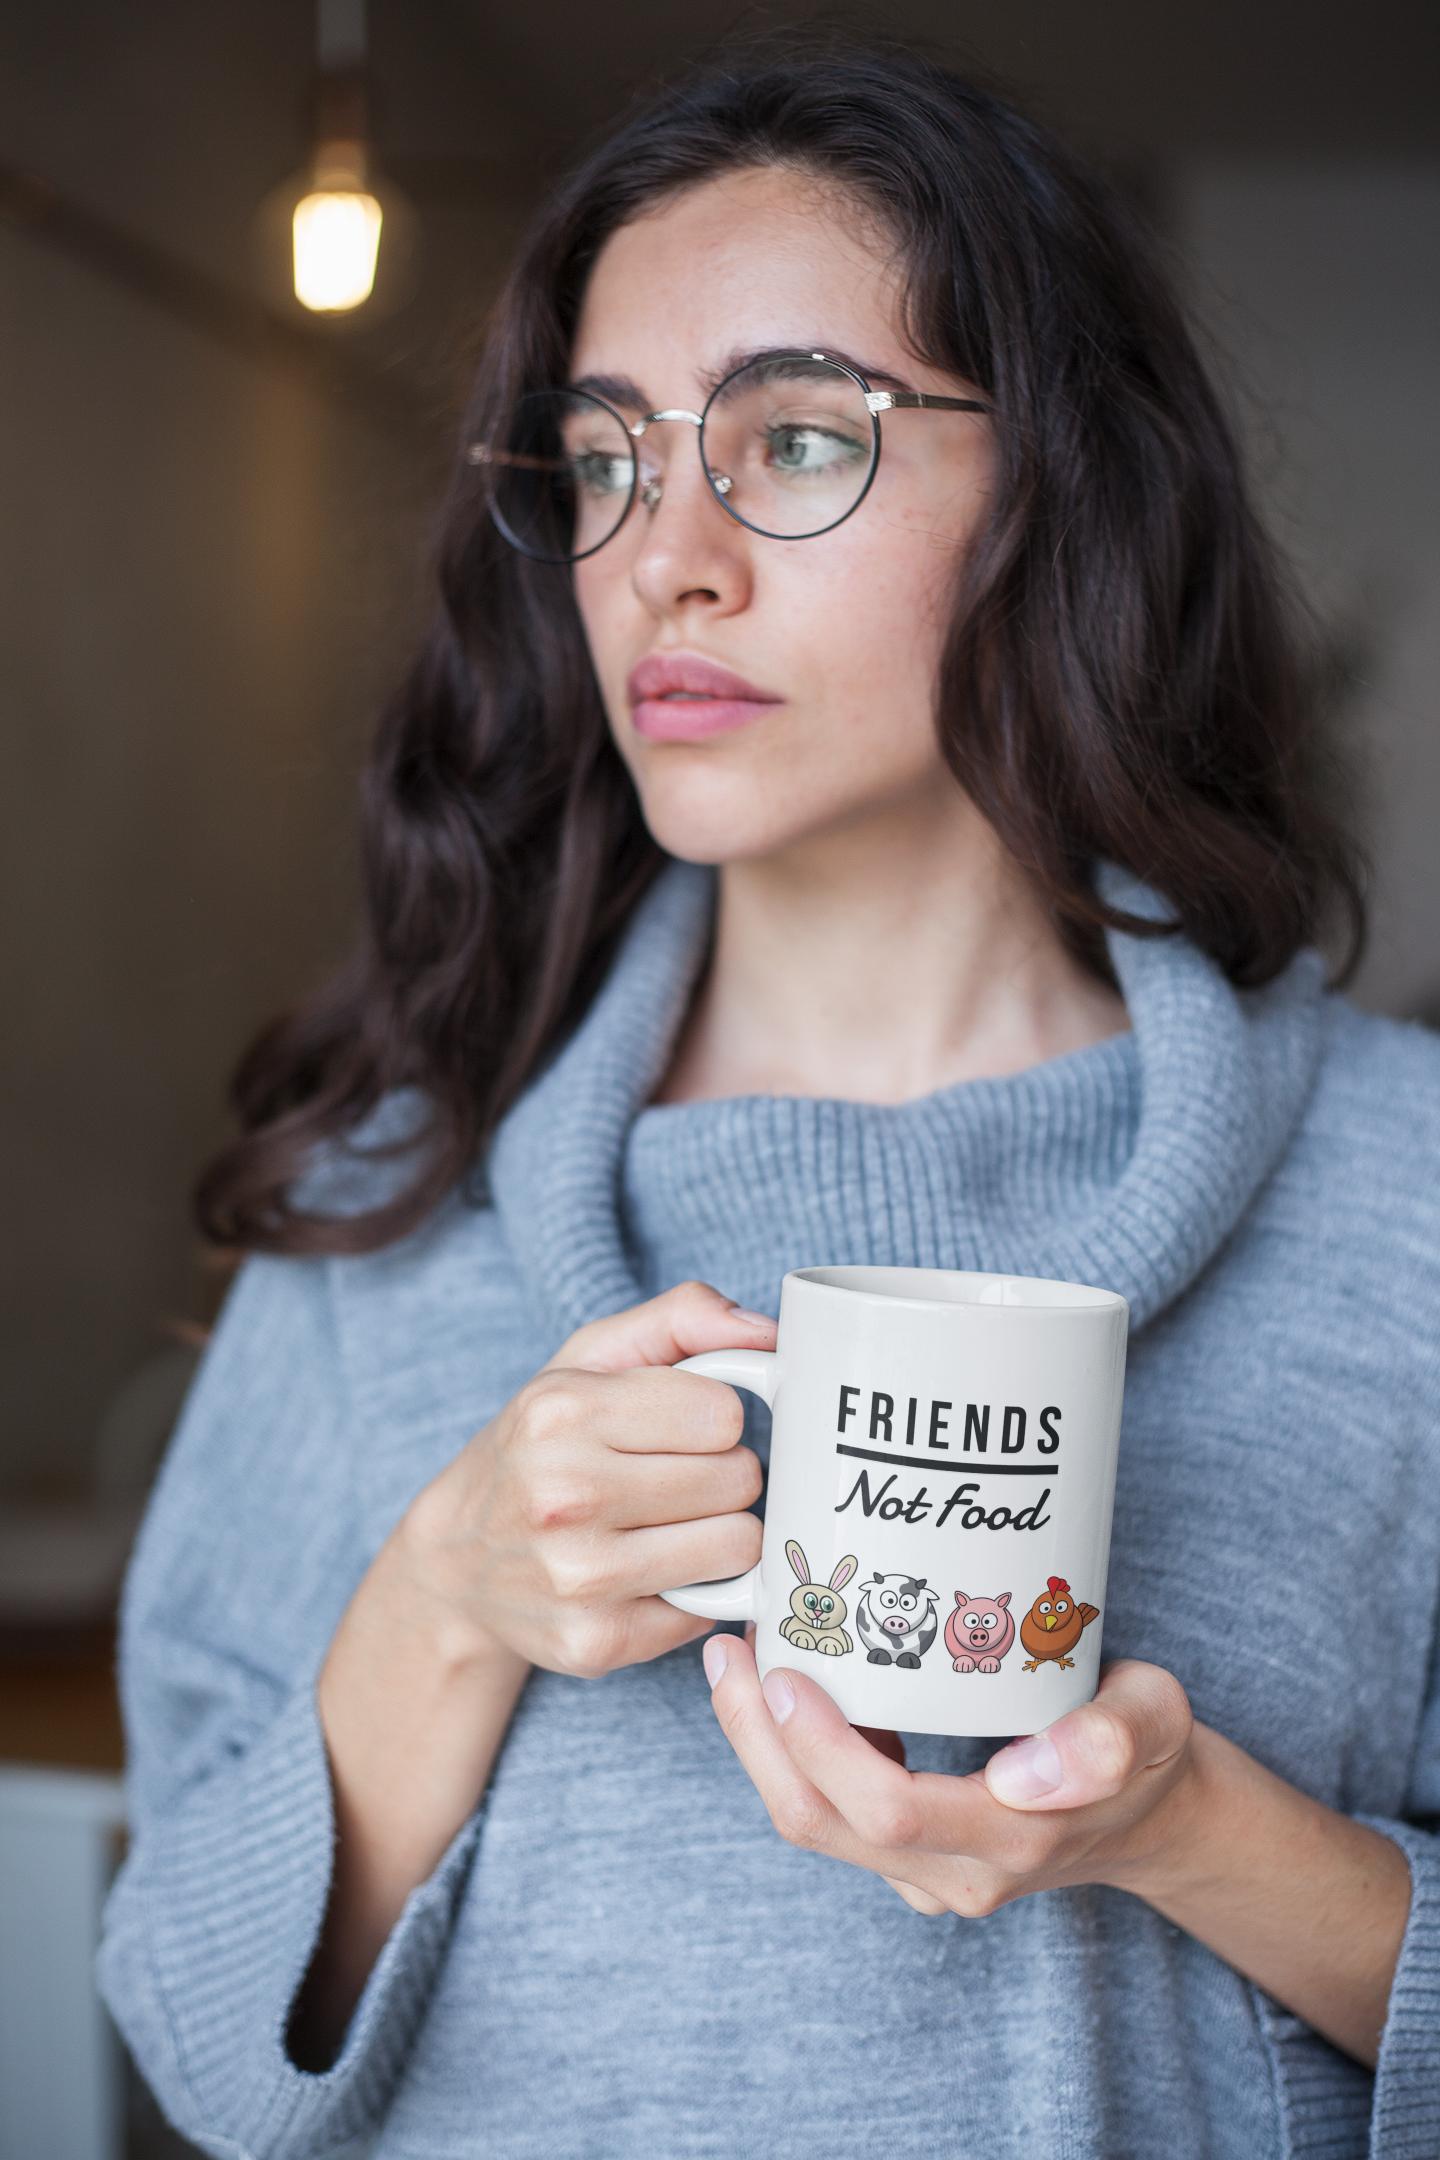 Funny Vegan Mug Friends Not Food Gag For Vegetarian Coffee Cup Birthday Gift Bday Coworkers Men Women Present Idea Boyfriend Girlfriend This Hilarious